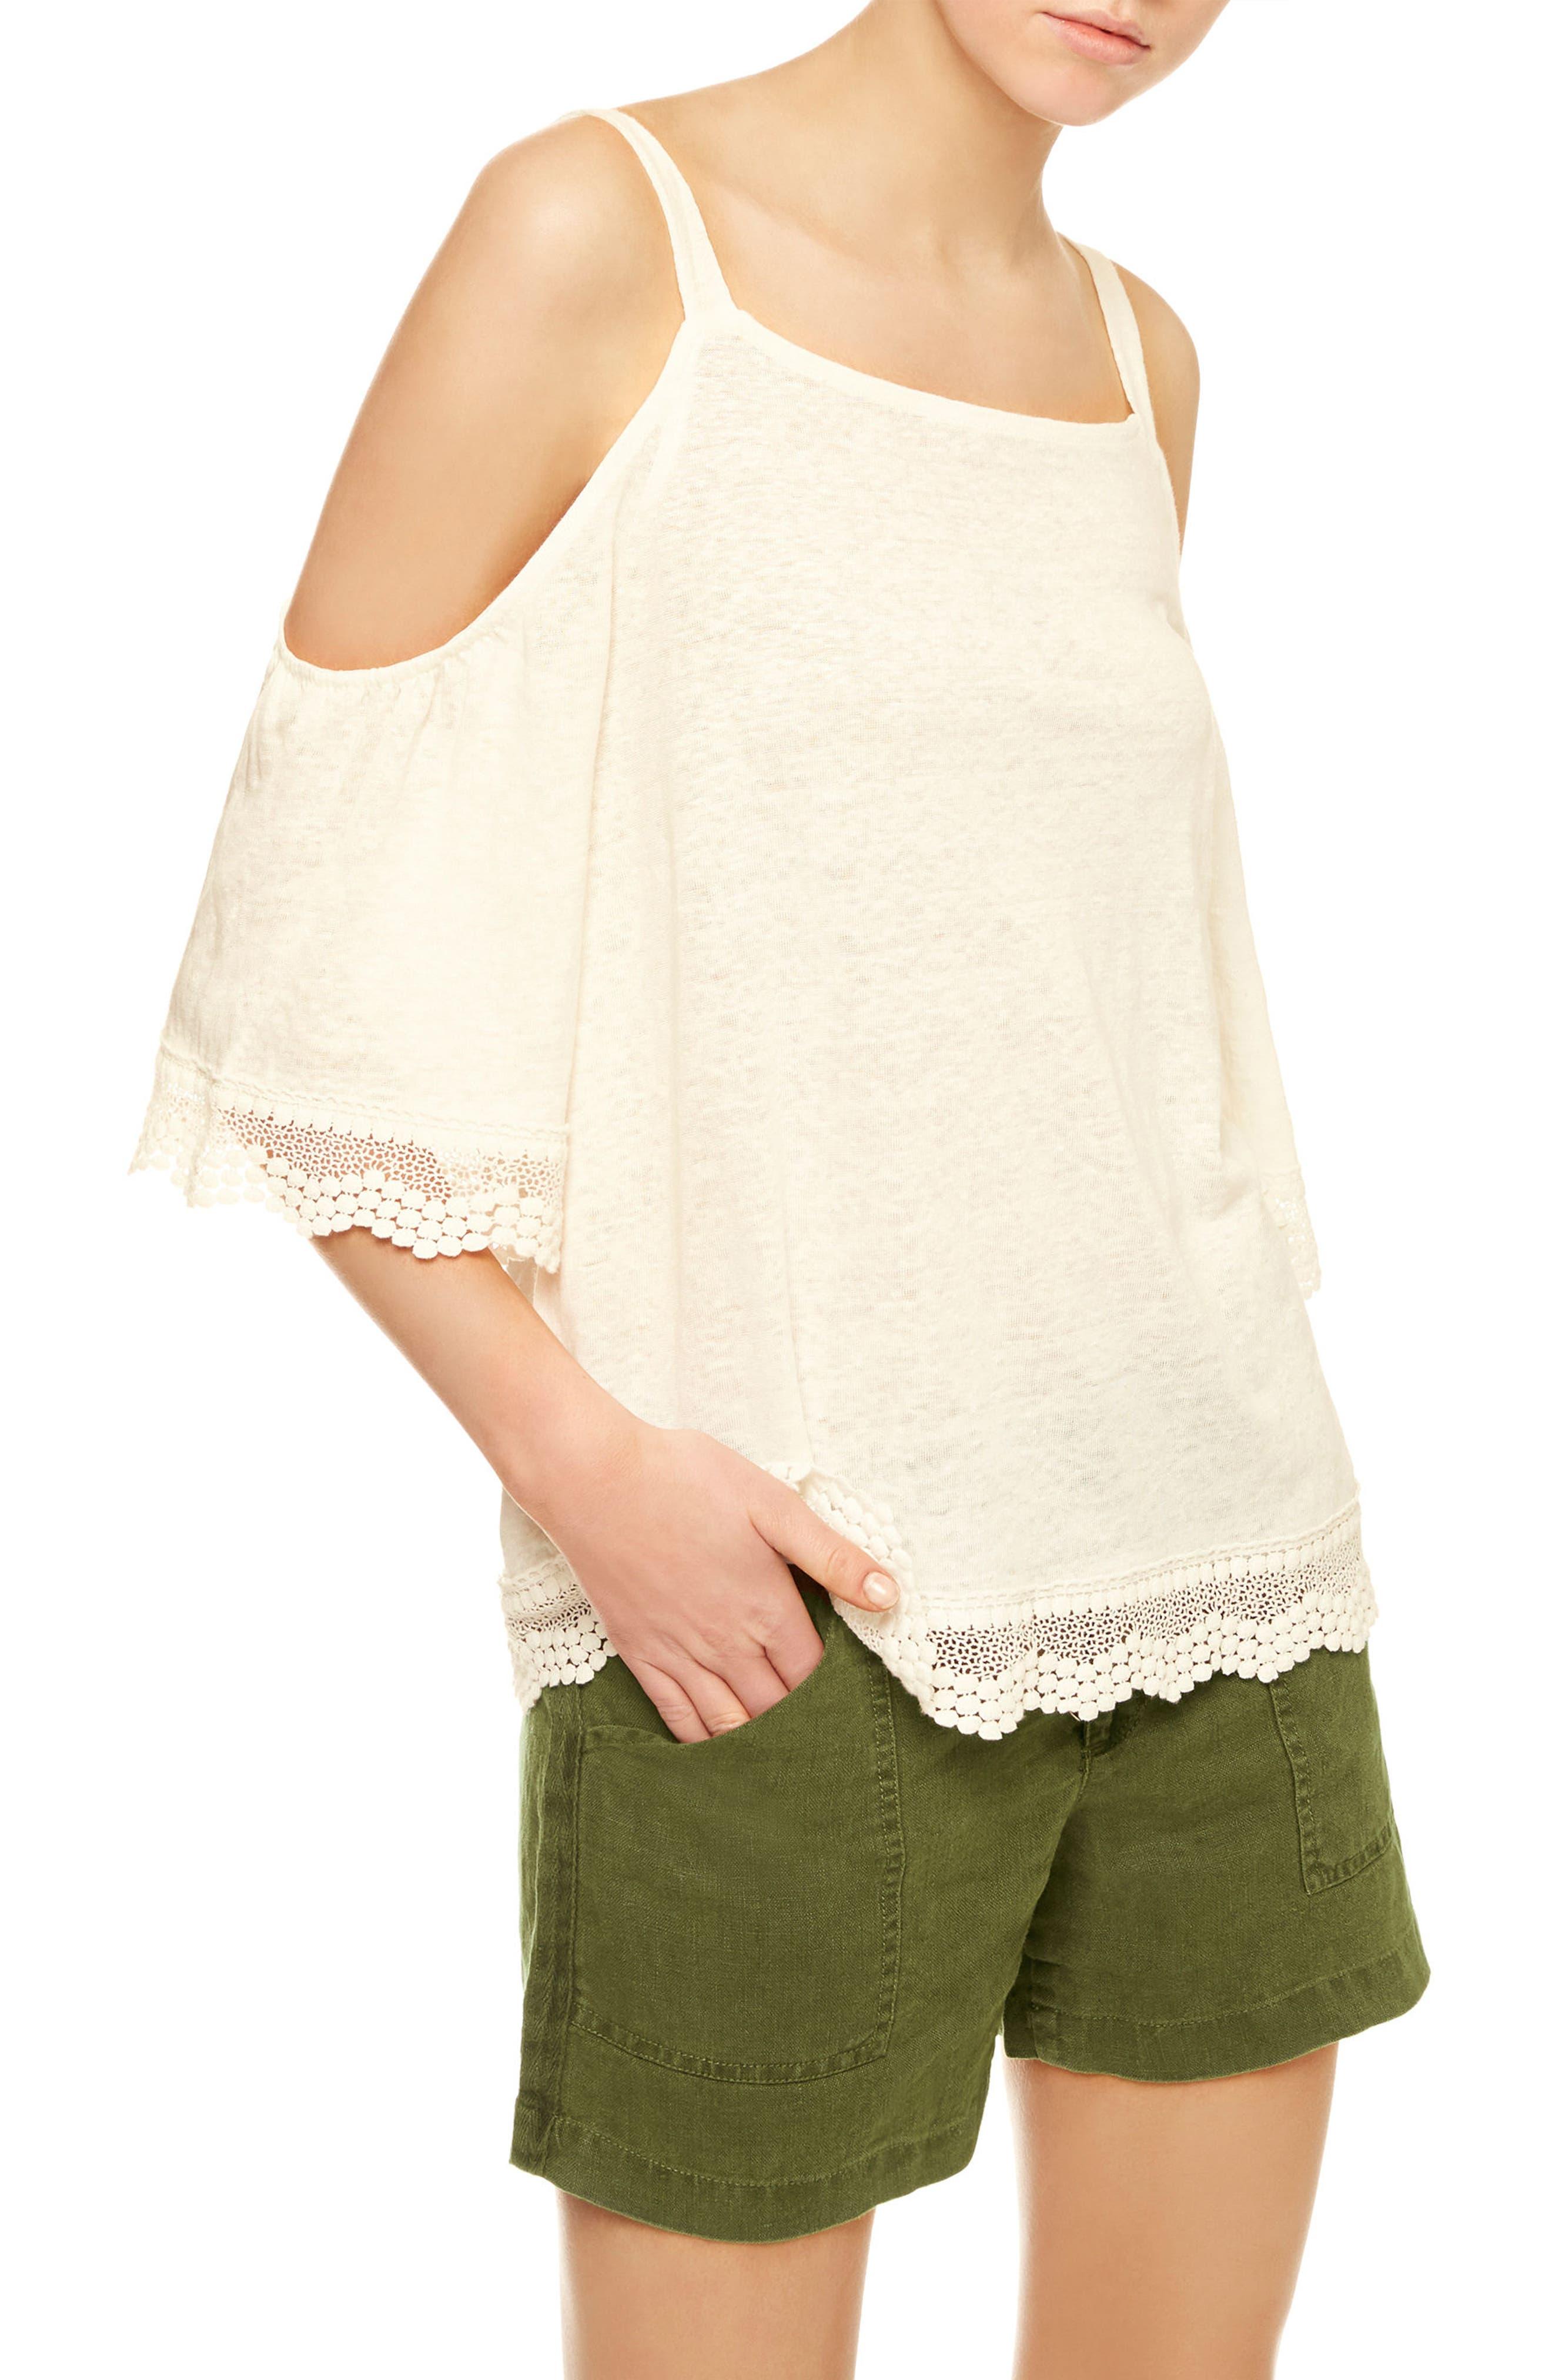 Alternate Image 1 Selected - Sanctuary Harmony Lace Trim Linen Knit Top